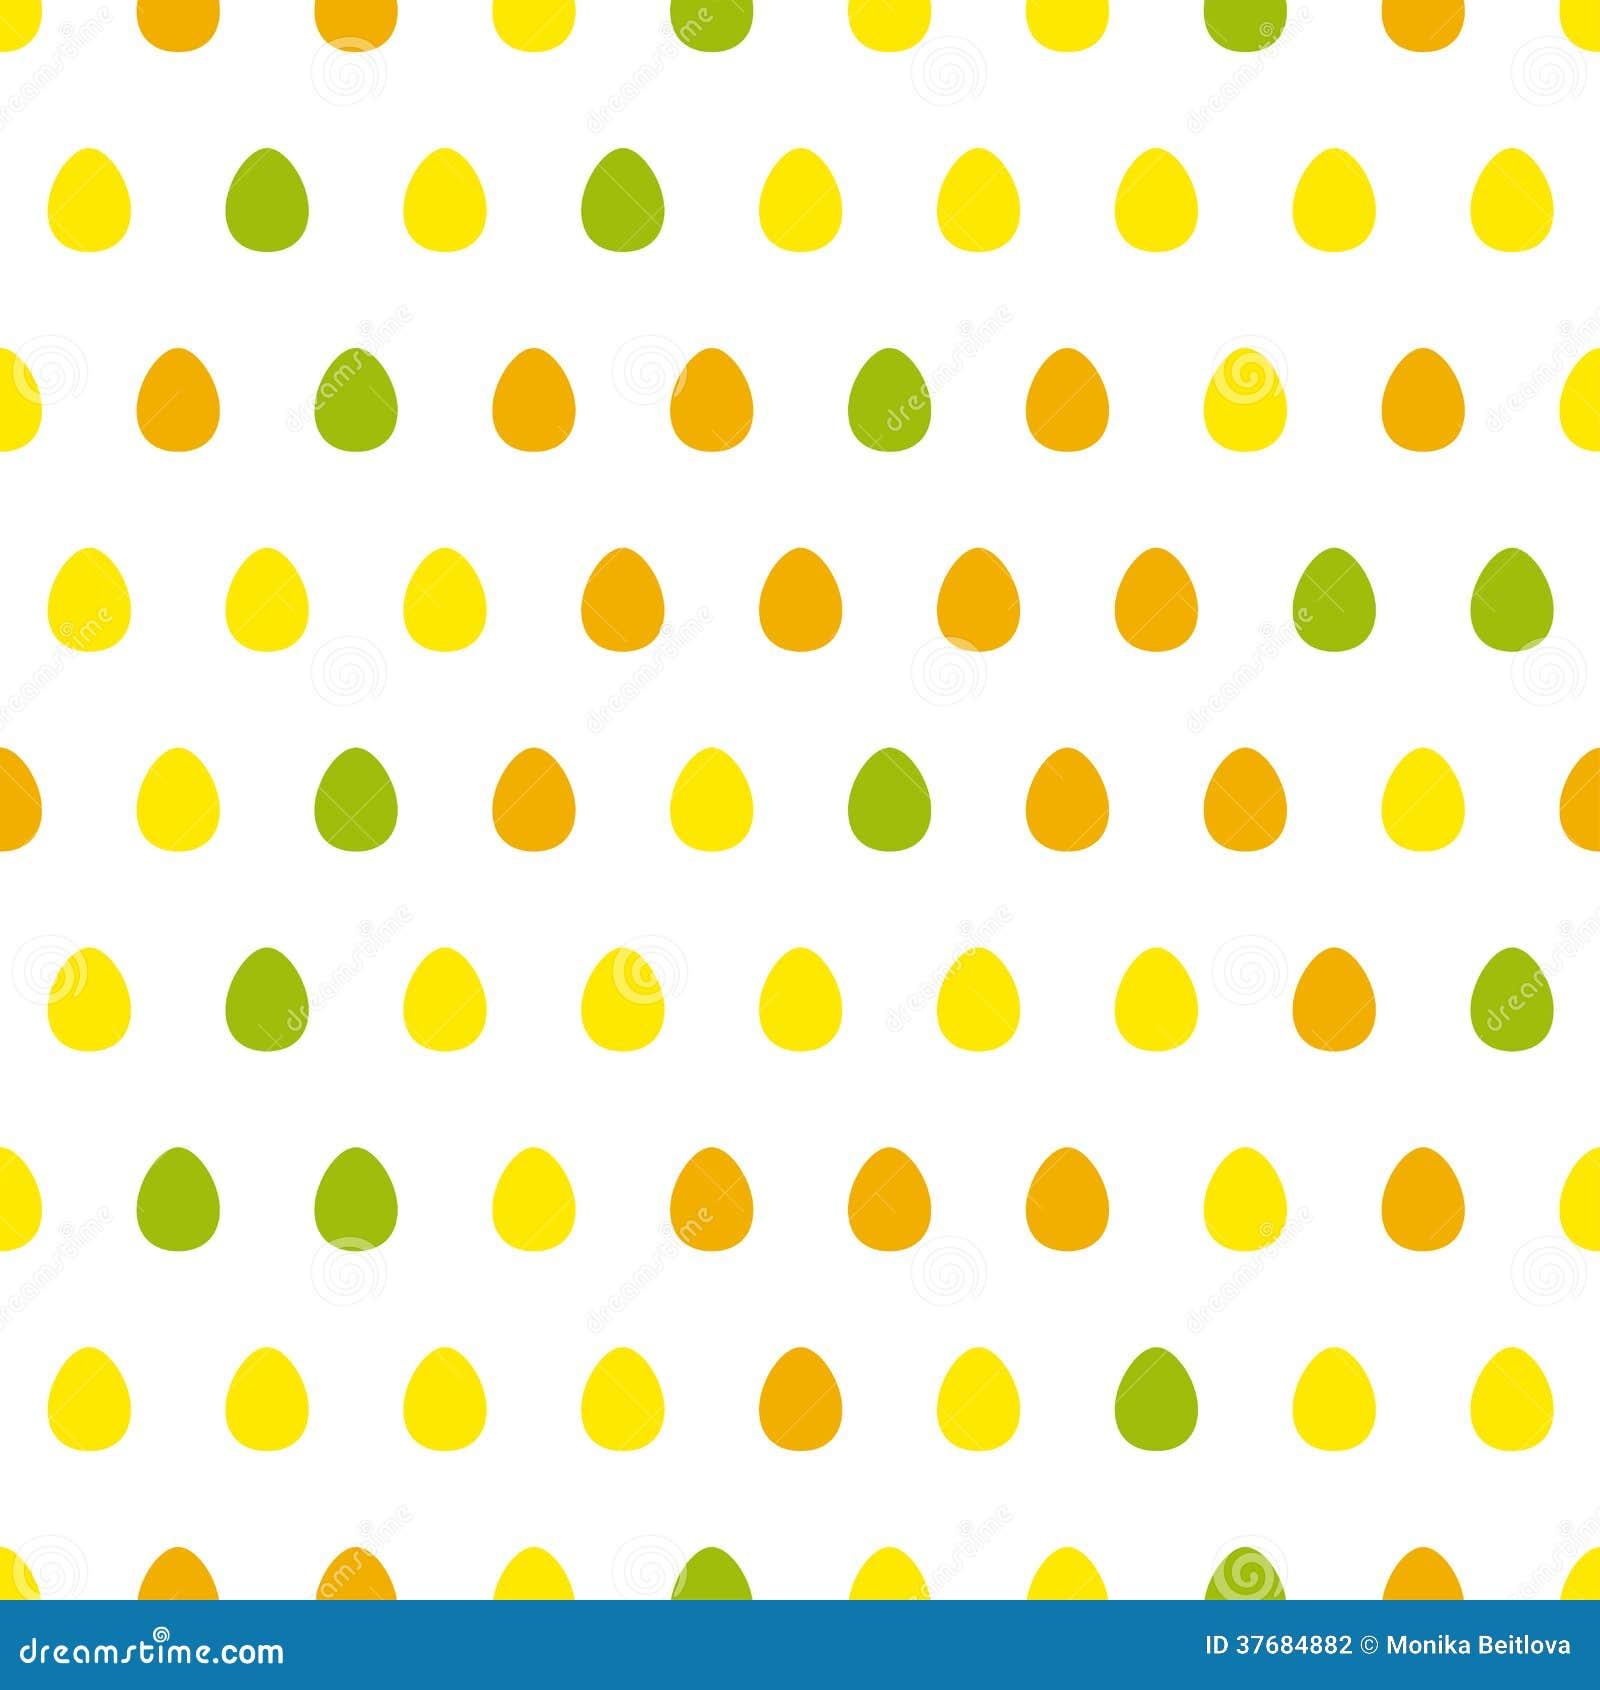 Egg Seamless Pattern Stock Photography - Image: 37684882